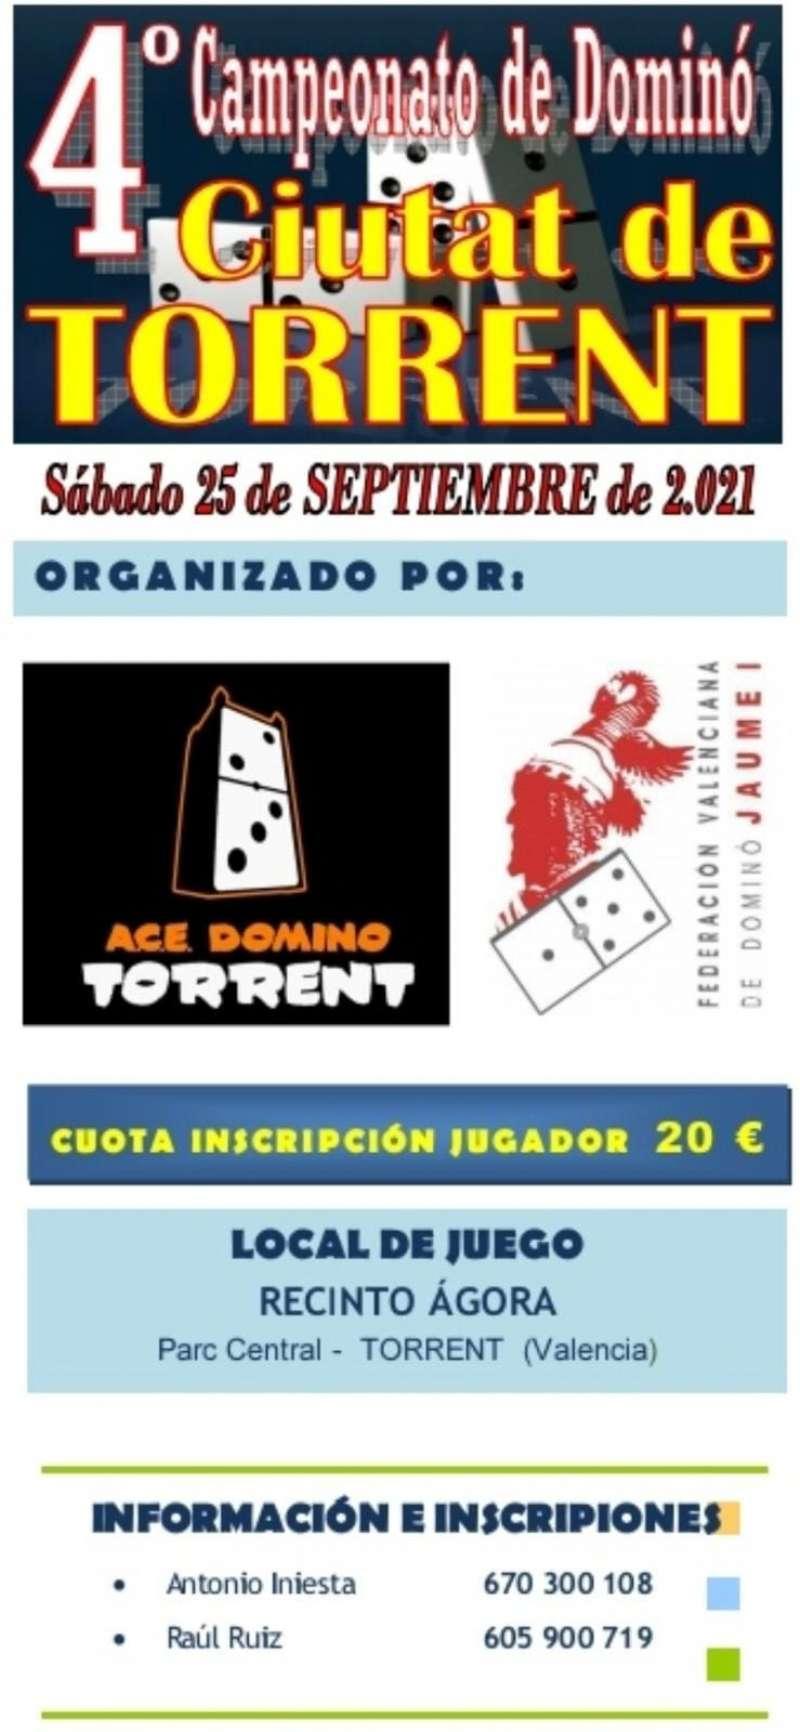 Cartel del Campeonato Dominó de Torrent.